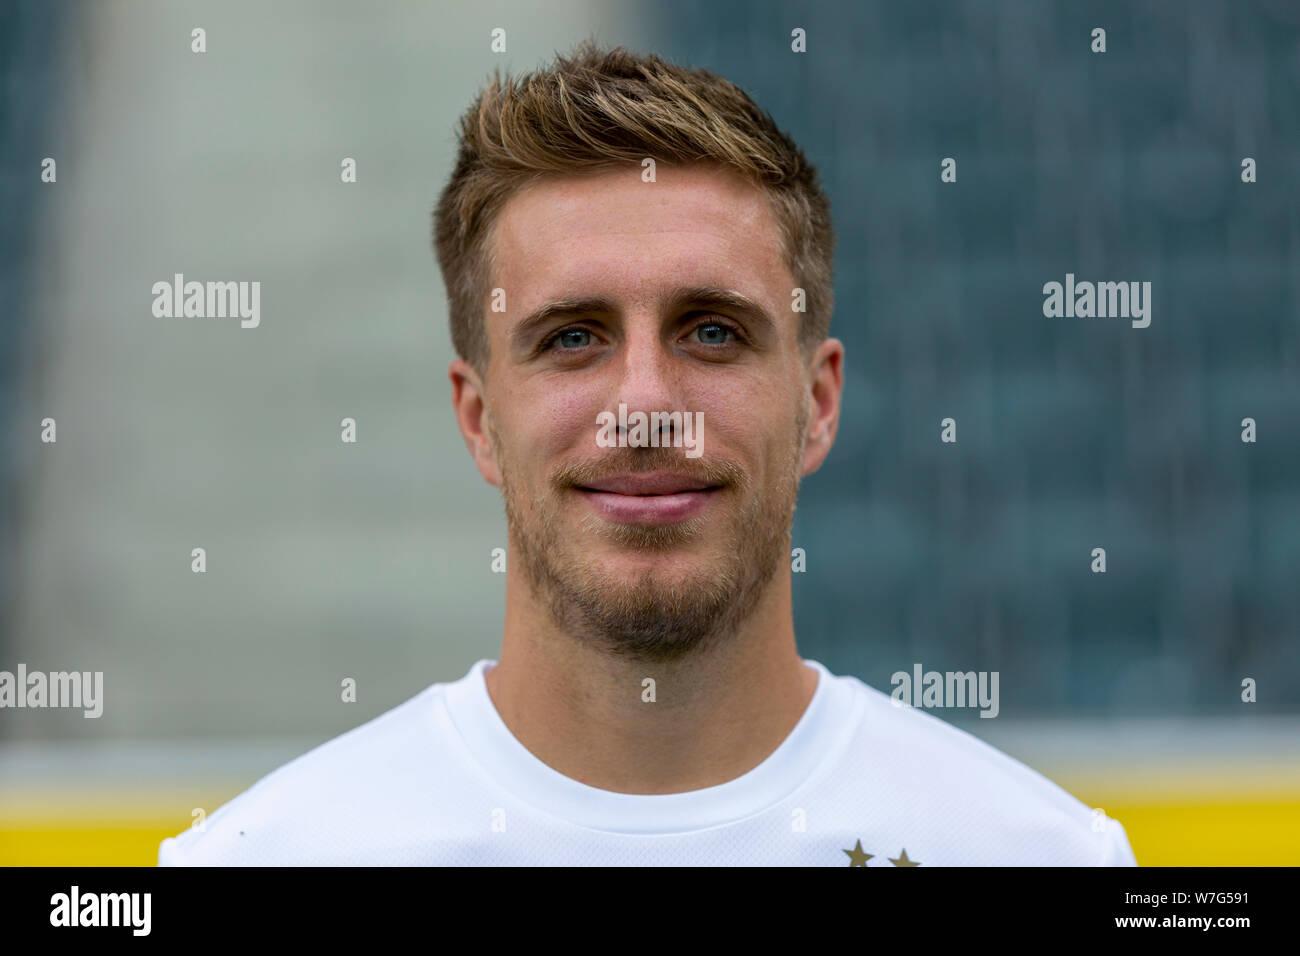 c7.alamy.com/comp/W7G591/football-bundesliga-20192020-borussia-moenchengladbach-press-photo-shooting-portrait-patrick-herrmann-W7G591.jpg